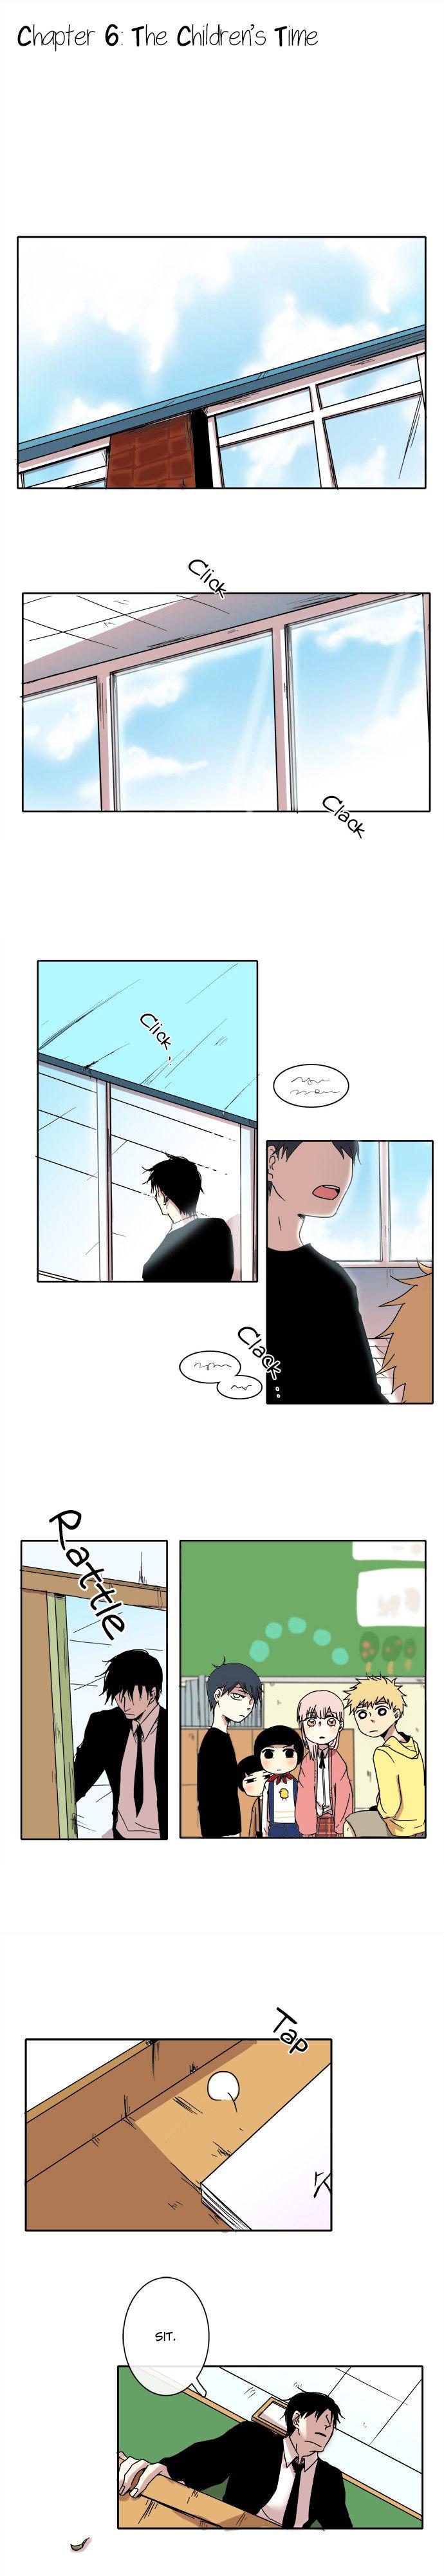 The Children's Teacher, Mr. Kwon 6 Page 2